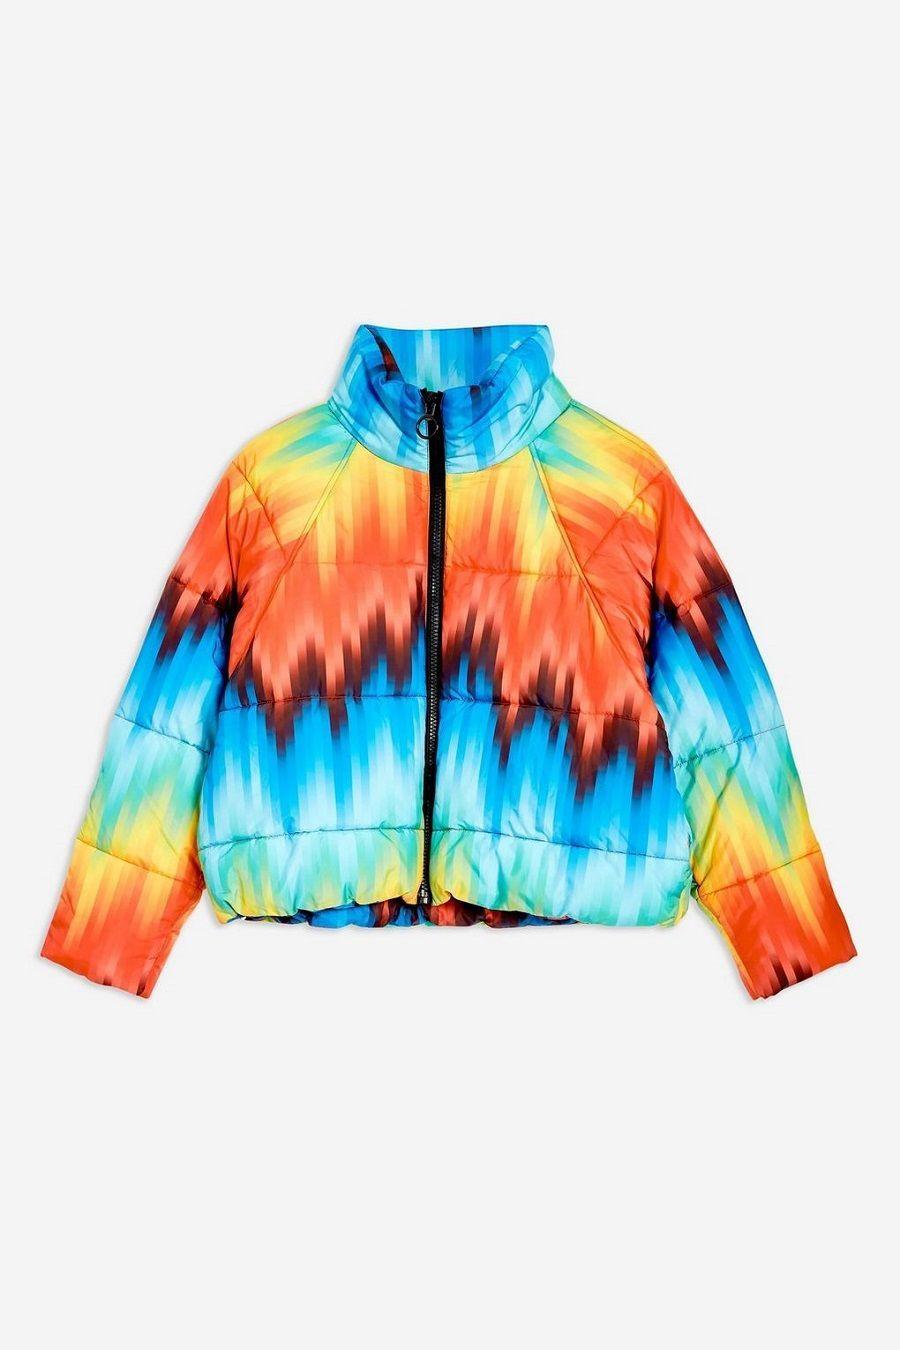 Pilihan Fashion Item dengan Motif-motif Seru yang Super Standout